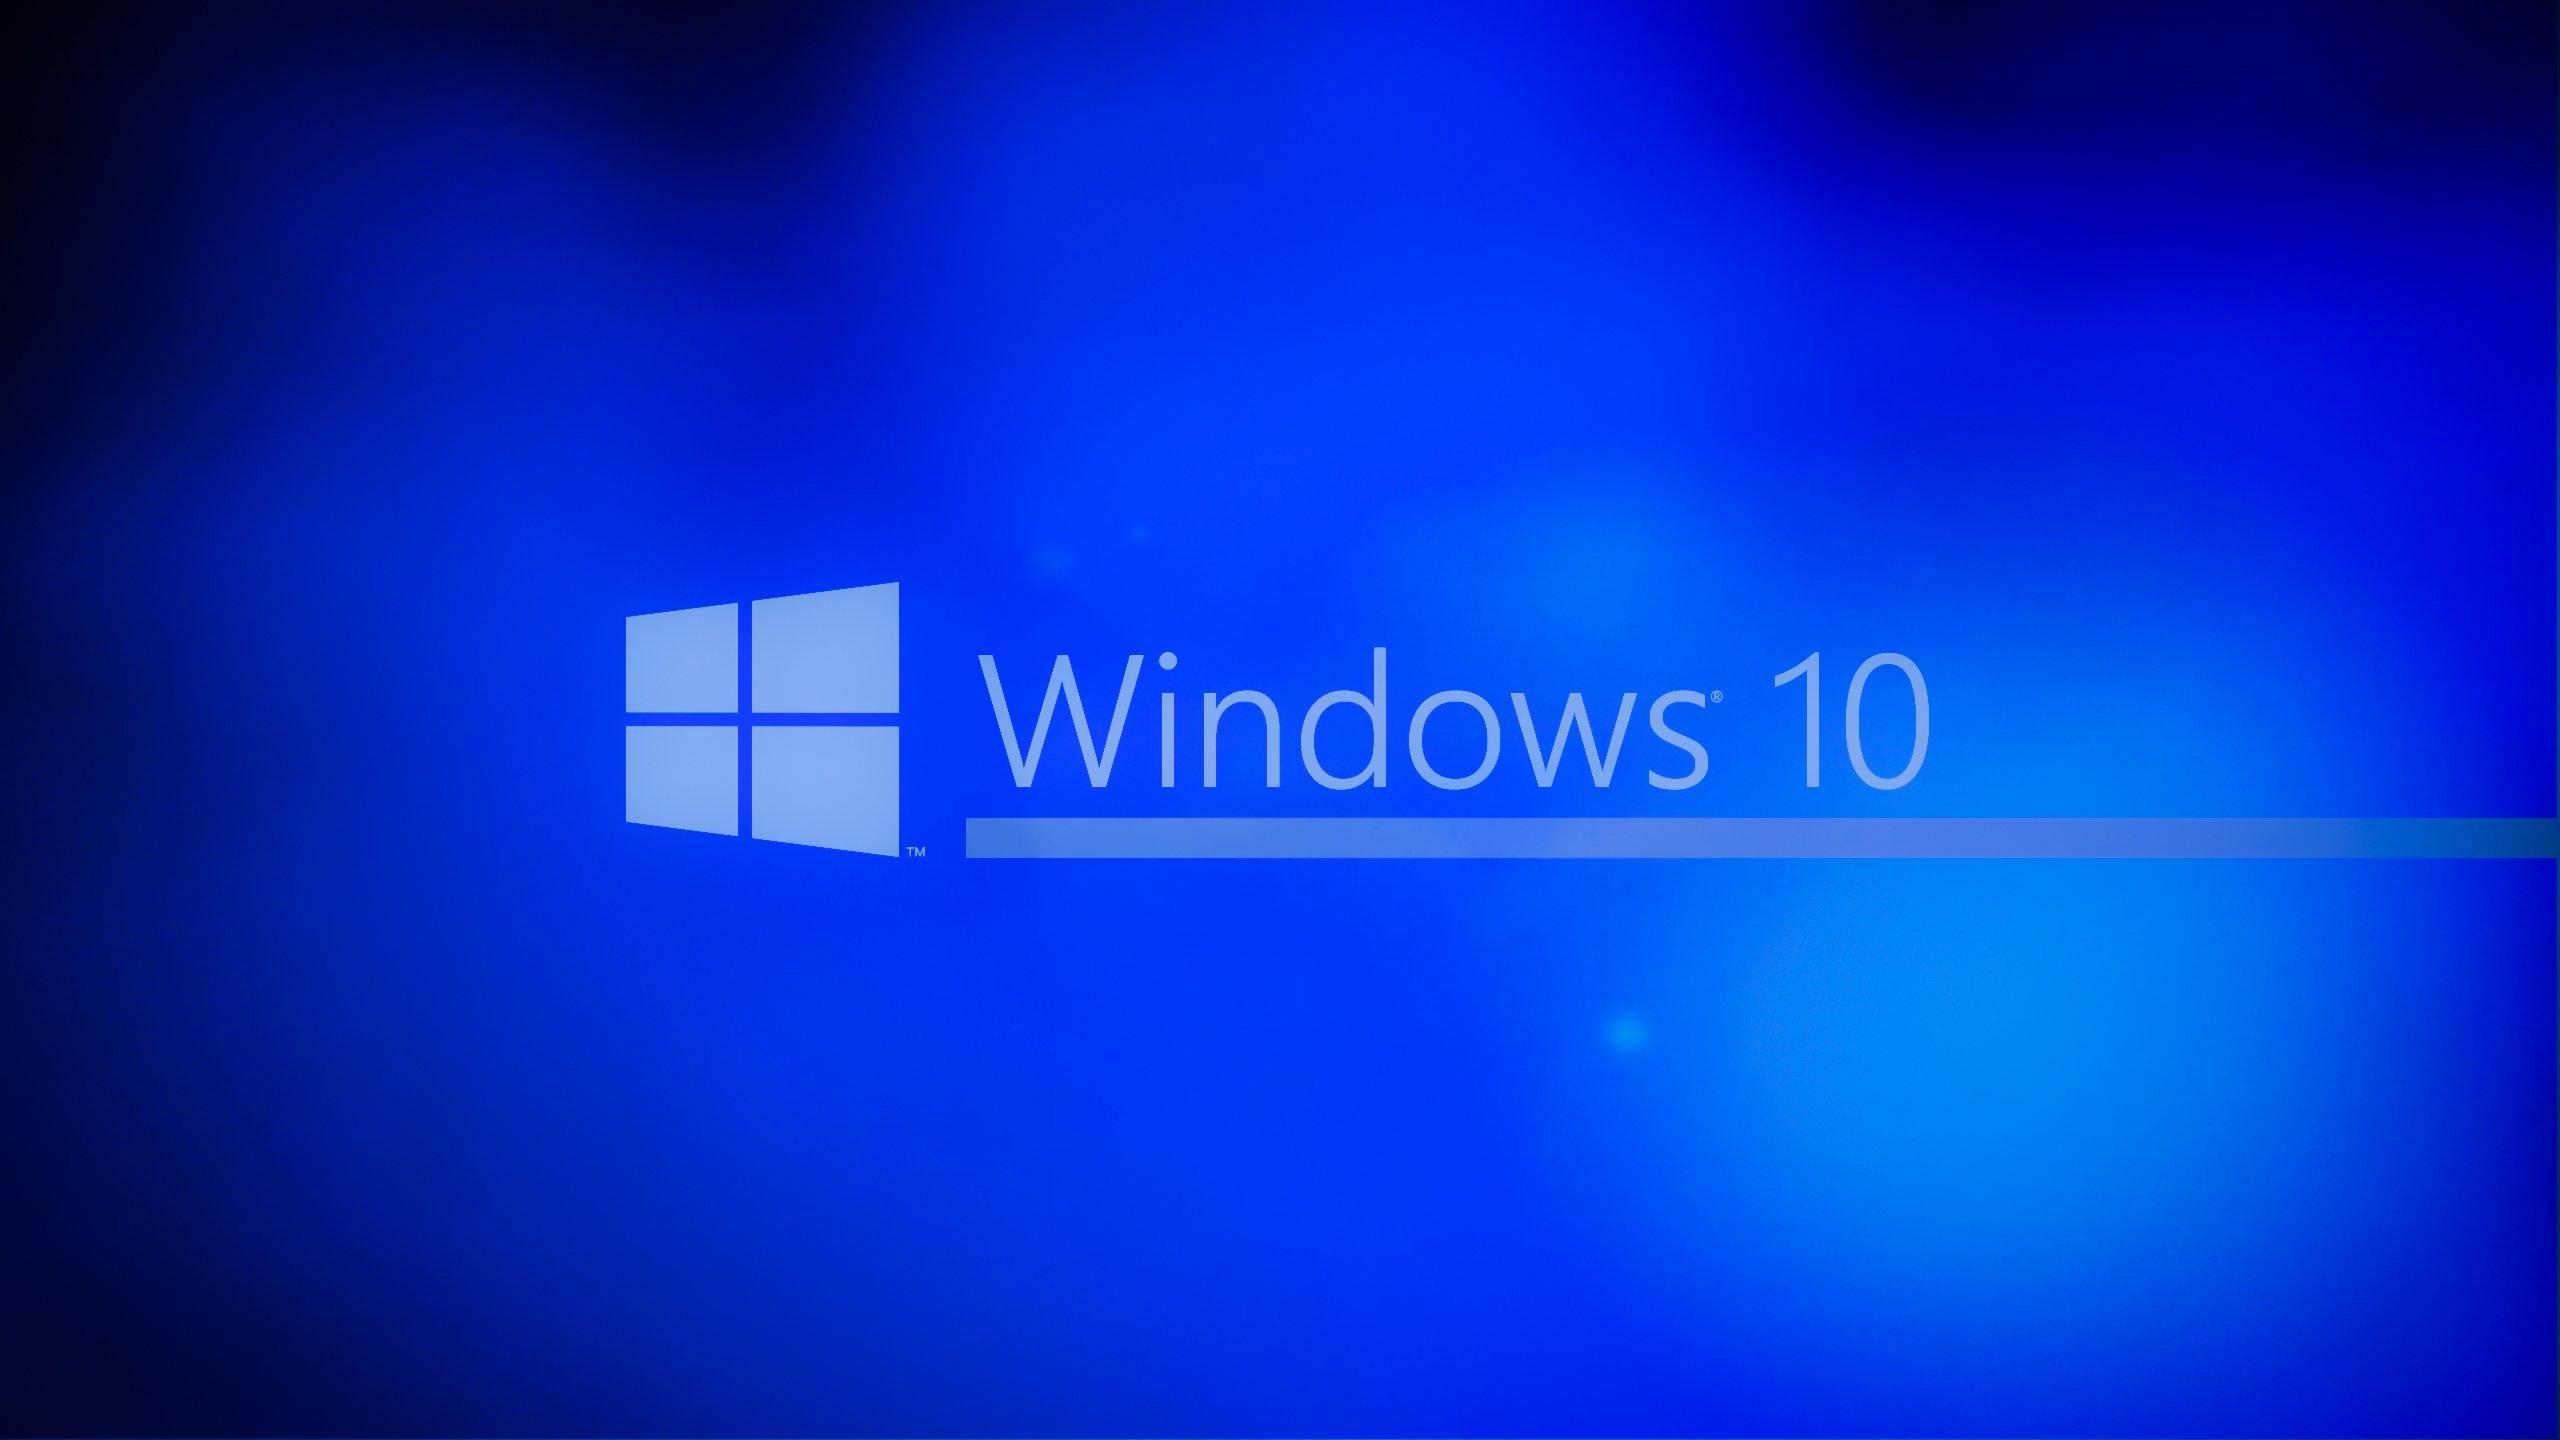 Free Download Windows 10 Wallpaper Logo Start Hd Wallpapers Ultra Hd Wallpapers 2560x1440 For Your Desktop Mobile Tablet Explore 48 Red Windows 10 Wallpaper Hd Wallpaper Windows Windows 10